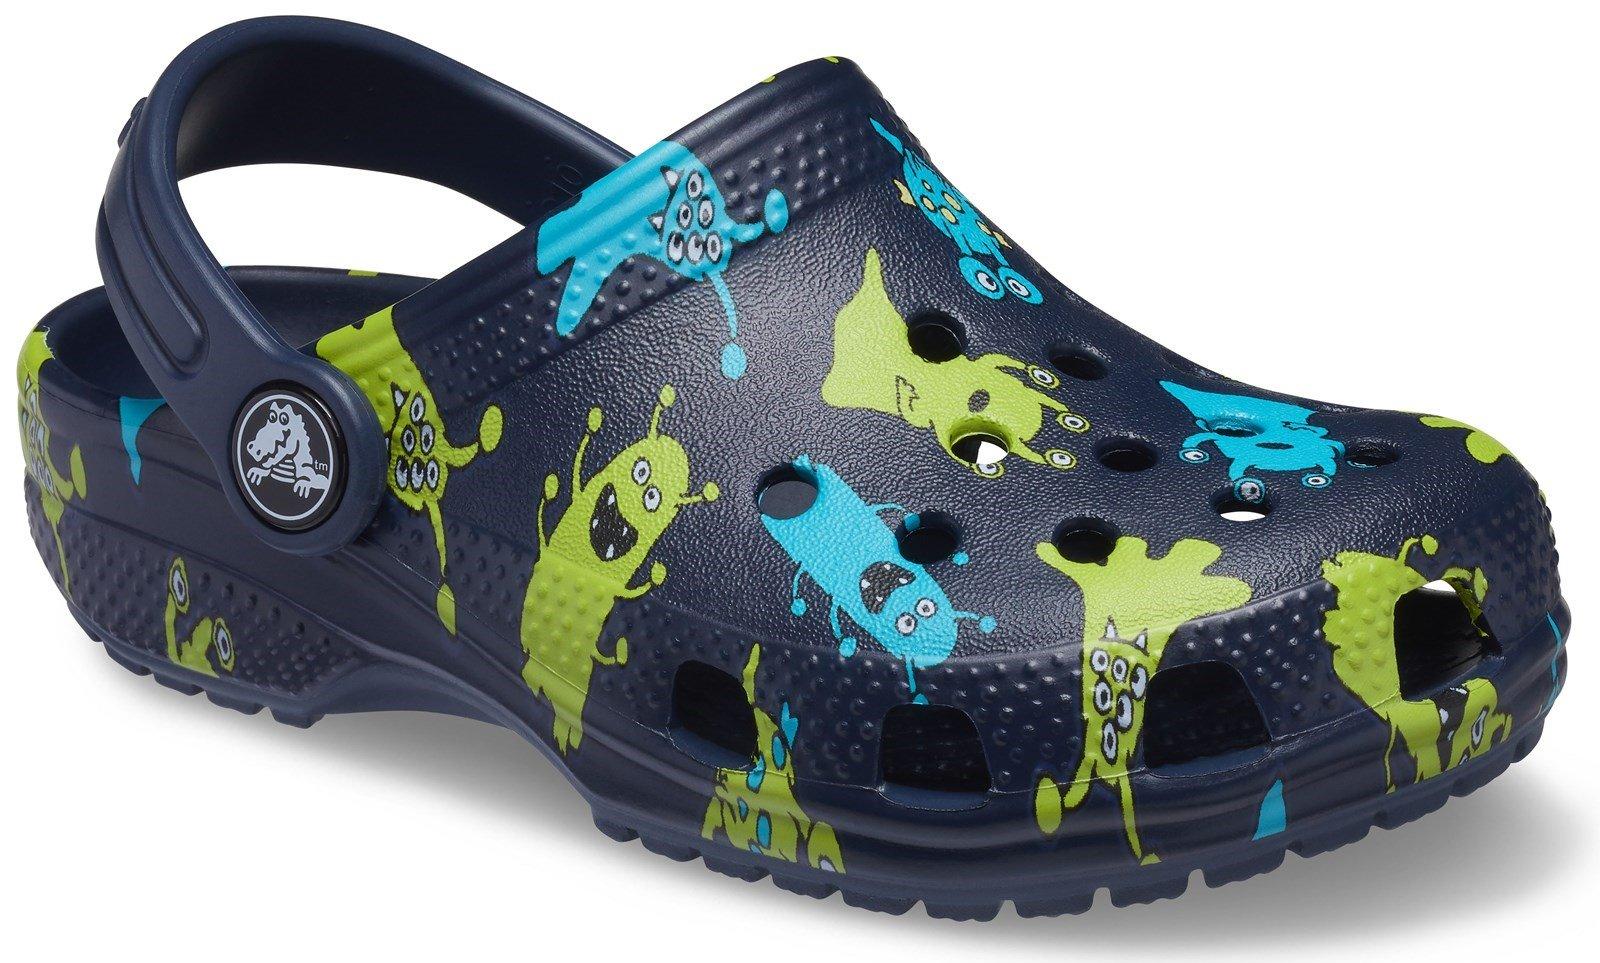 Crocs Kid's Classic Monster Print Clog Sandal Navy 31878 - Navy 4